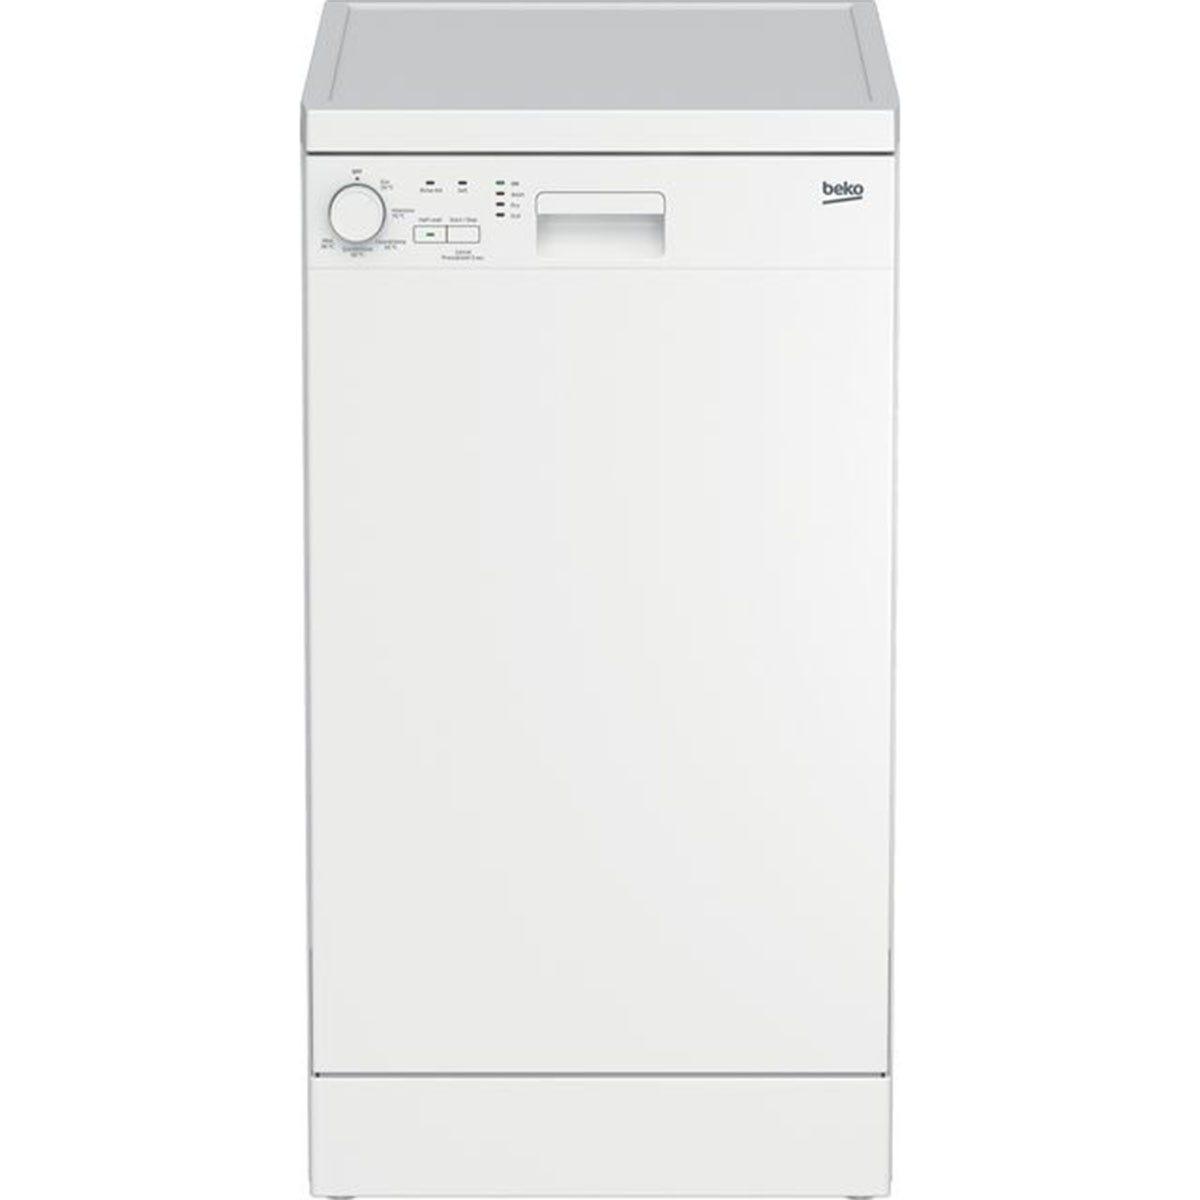 Beko DFS05020W Slimline Dishwasher - White